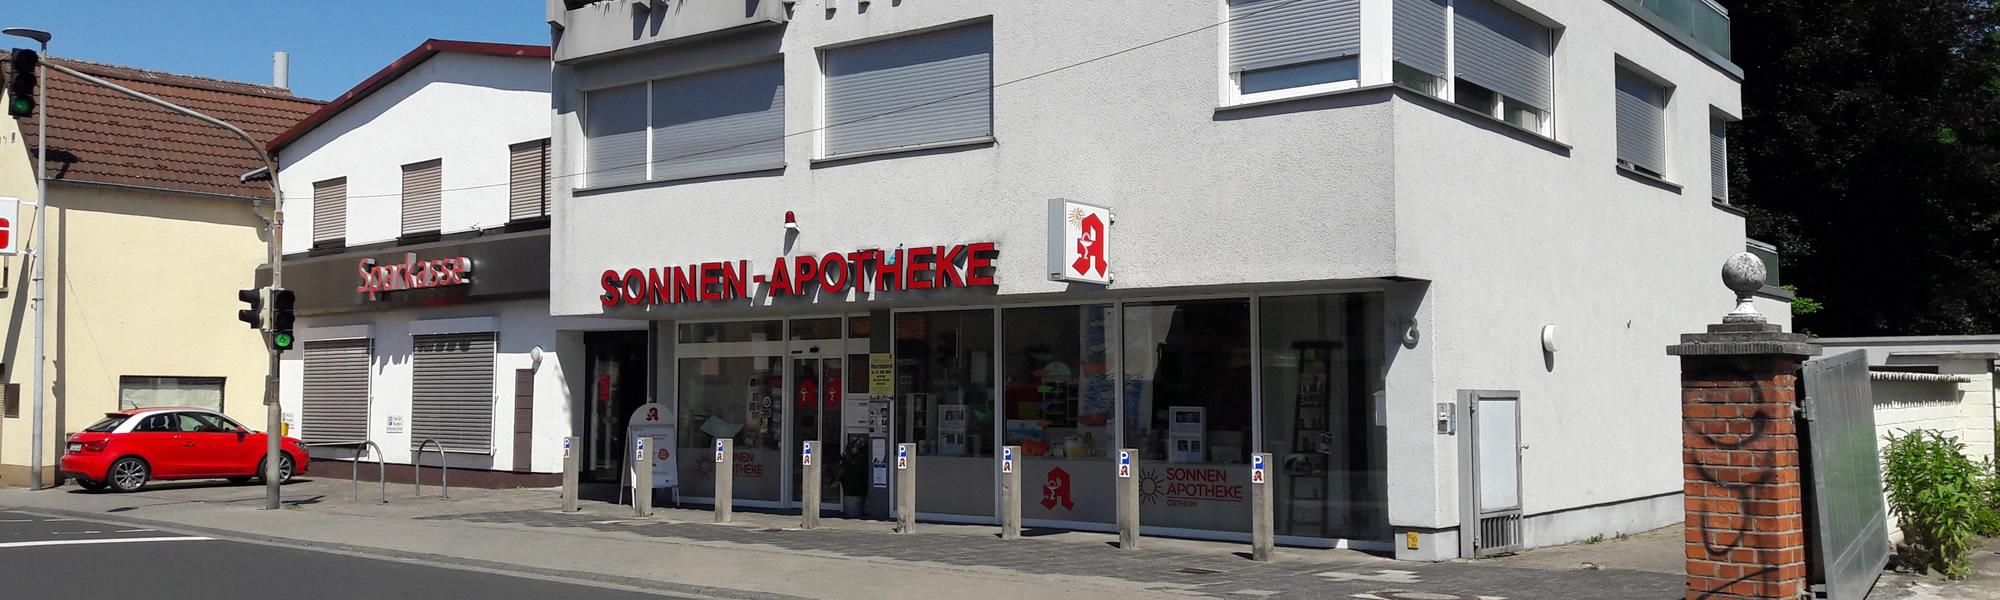 Sonnen-Apotheke Ostheim